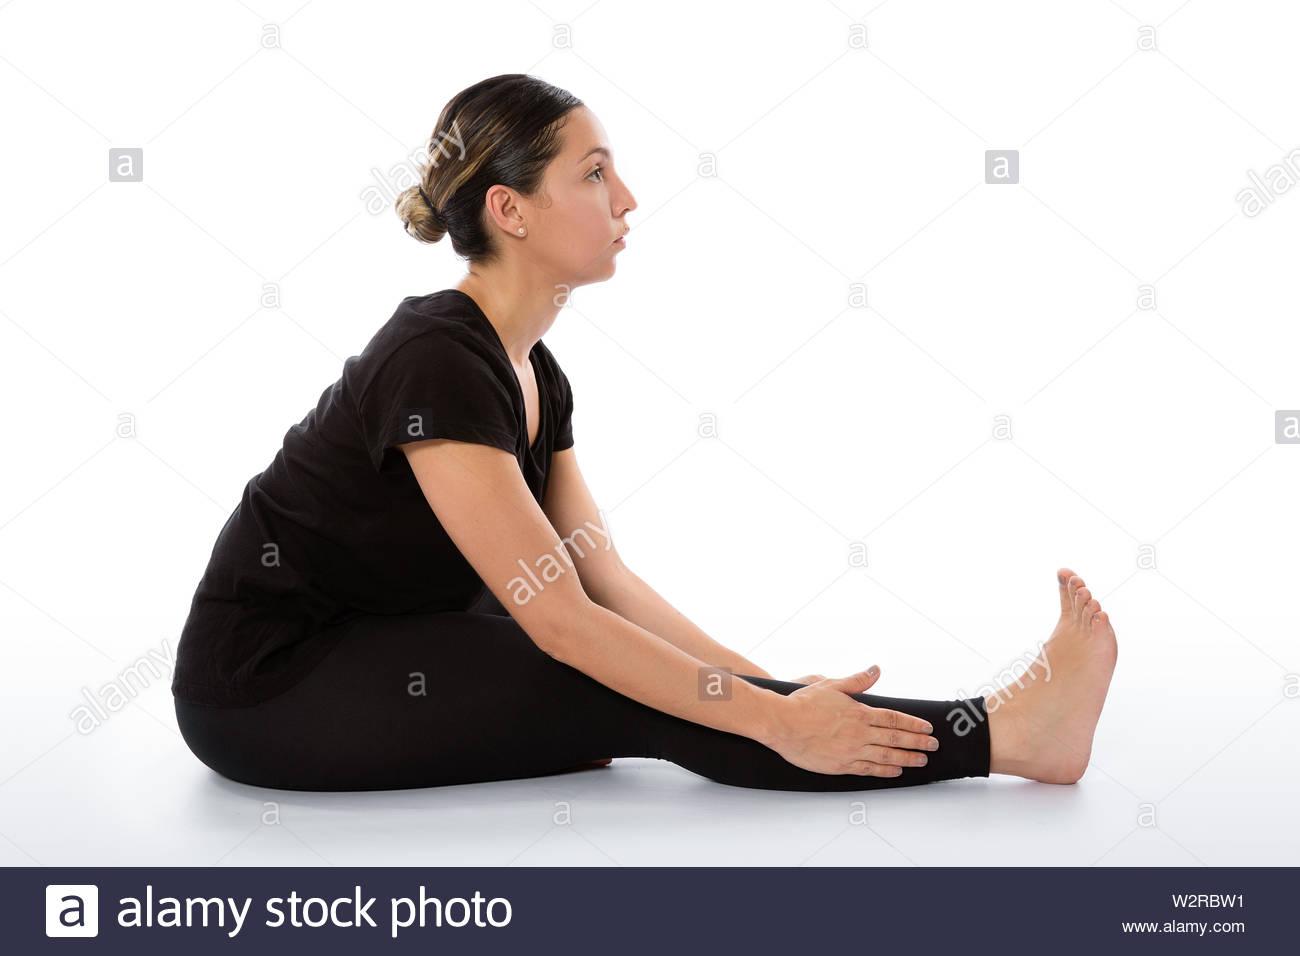 Paschimottanasana yoga pose (Seated Forward Bend pose). Yoga poses woman isolated with white background. Yoga pose set. Mindfulness and Spiritually co Stock Photo